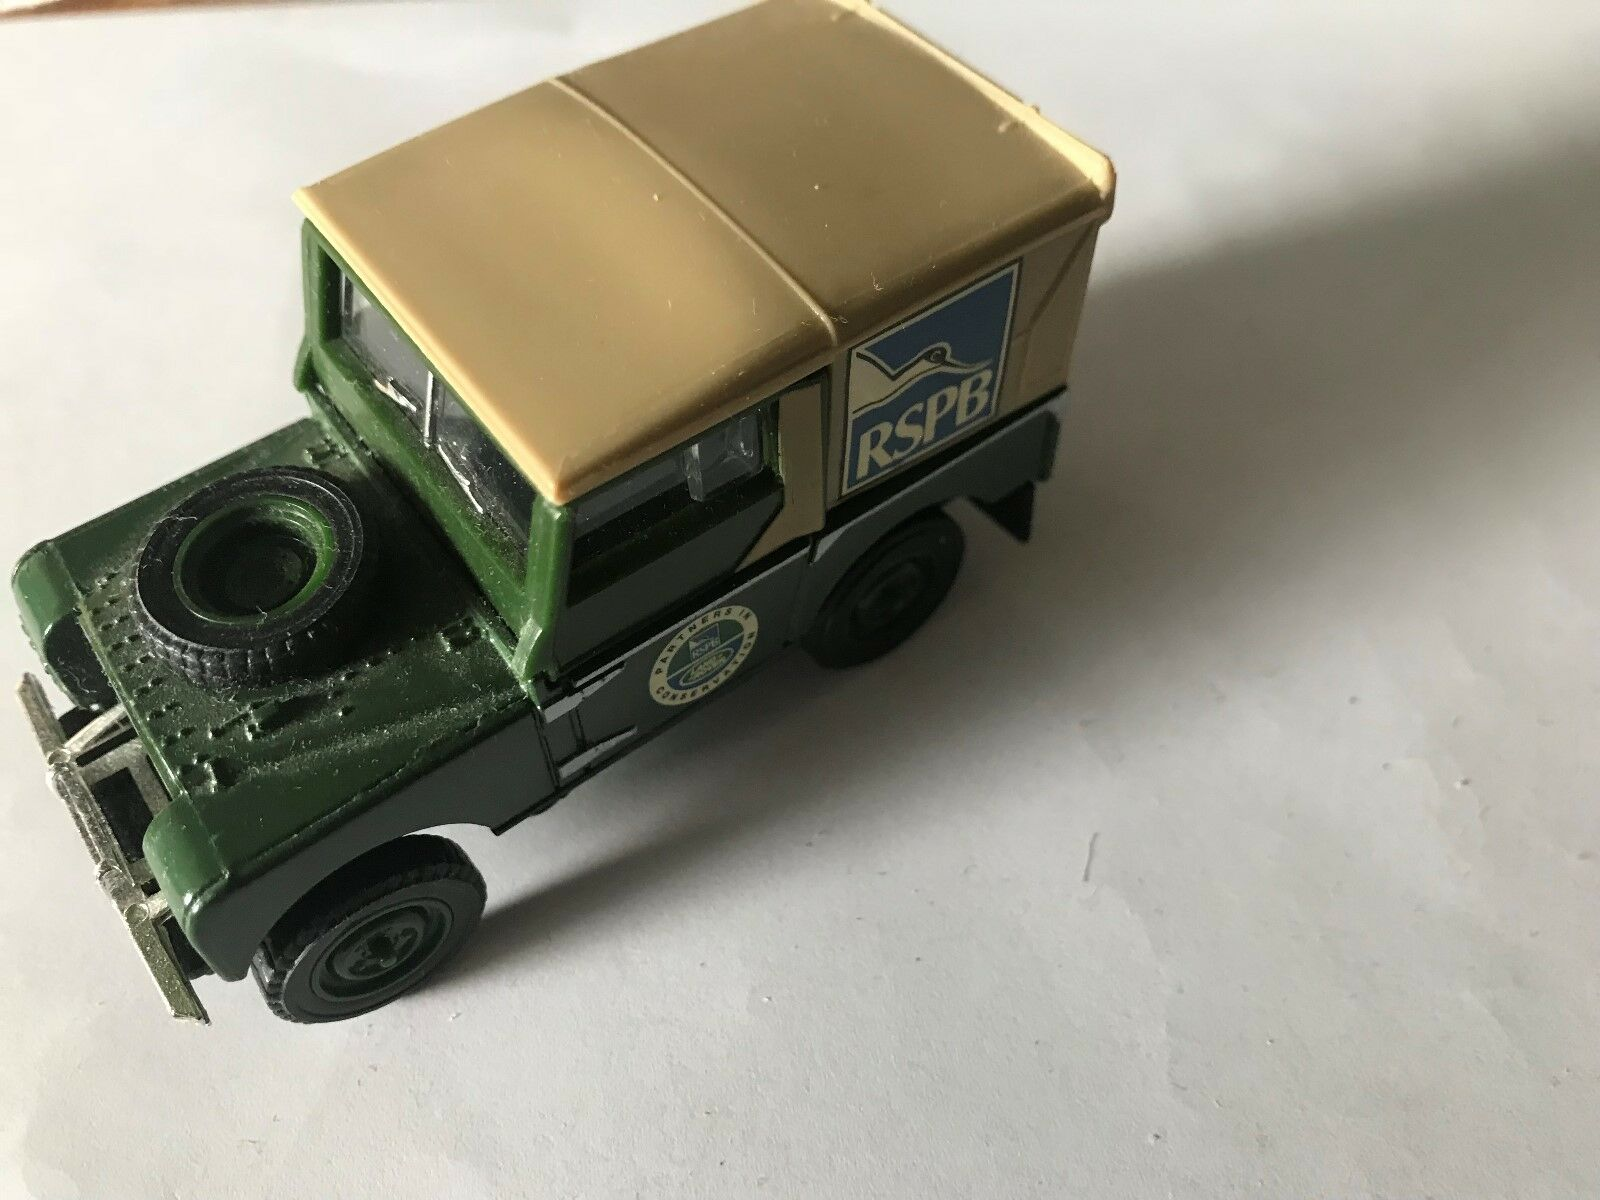 RARE, dy-09 Land Rover, Olive/marrone  rspa , Dinky, pre-Pro, NO BOX